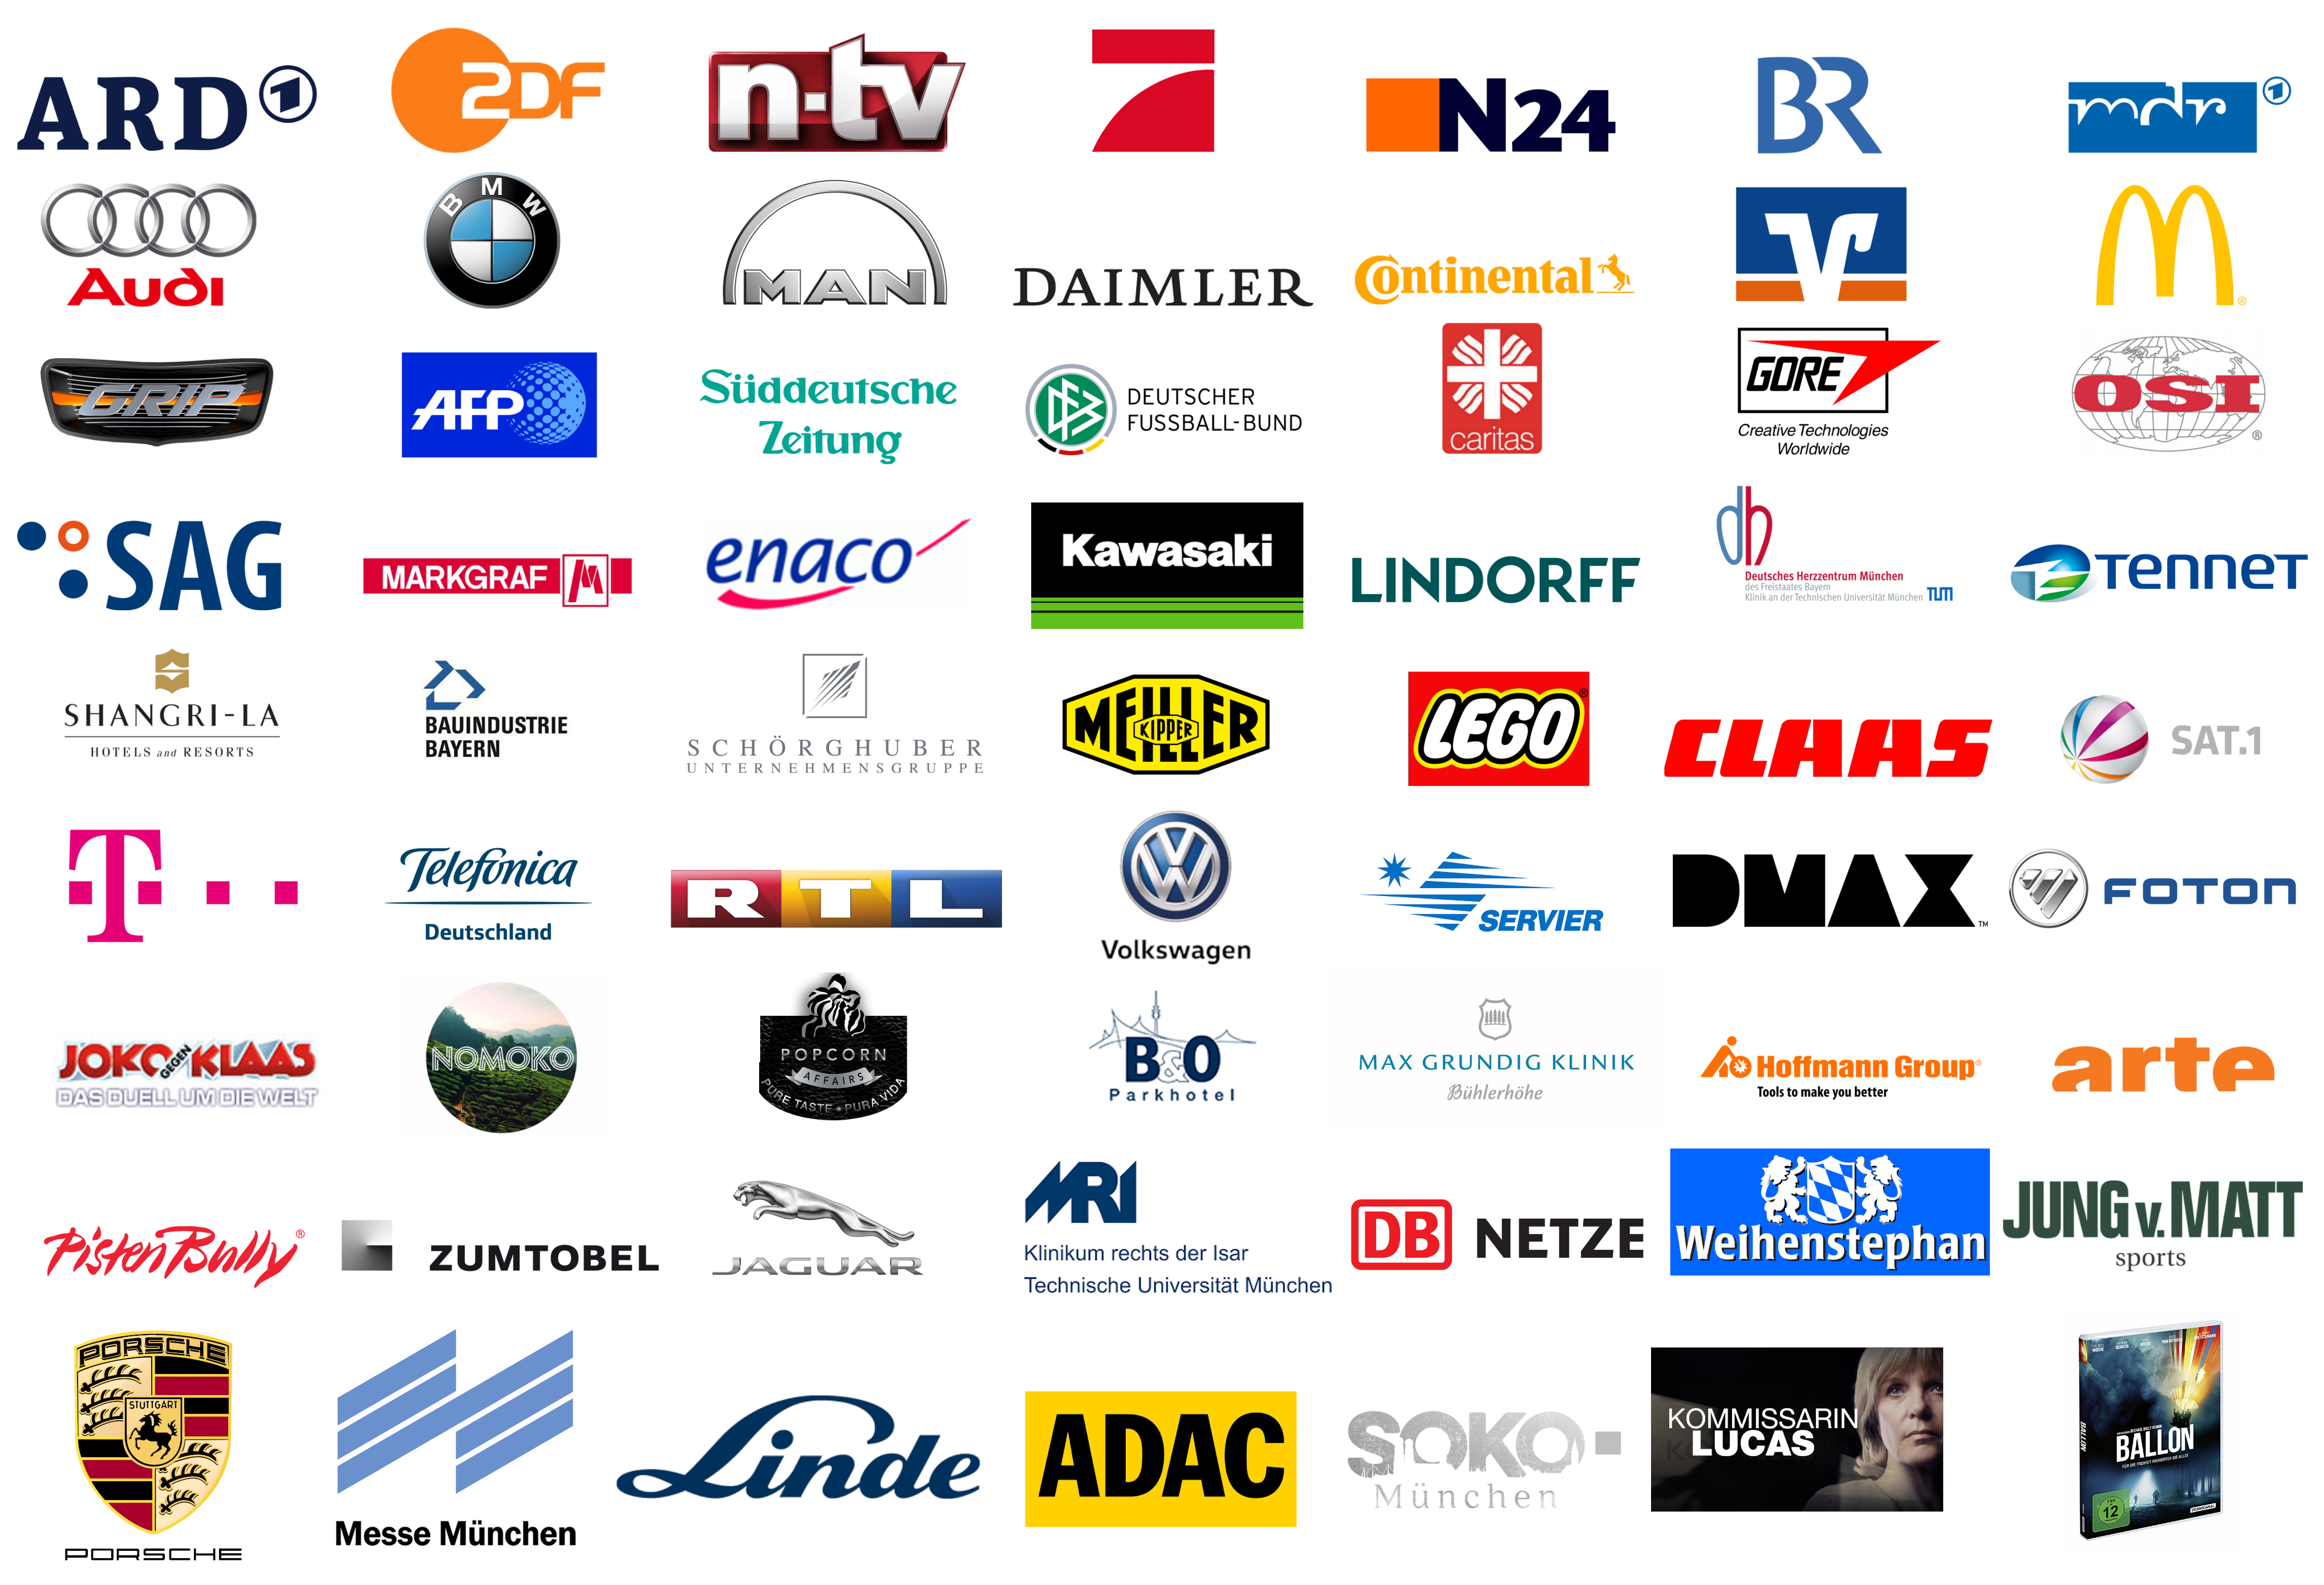 Drohnenpilot DJI ARD, ZDF, N-TV, ProSieben, N24, BR, MDR, Audi, BMW, MAN, Jaguar, Daimler, Continental, Volksbank, Mc Donalds, Grip, AFP, Süddeutsche Zeitung, DFB, Caritas, Gore, OSI, SAG, Markgraf, Enaco, Kawasaki, Lindorff, DHZ, Tennet, Meiller, Lego, Claas, Sat.1, RTL, DMAX, Foton, Servier